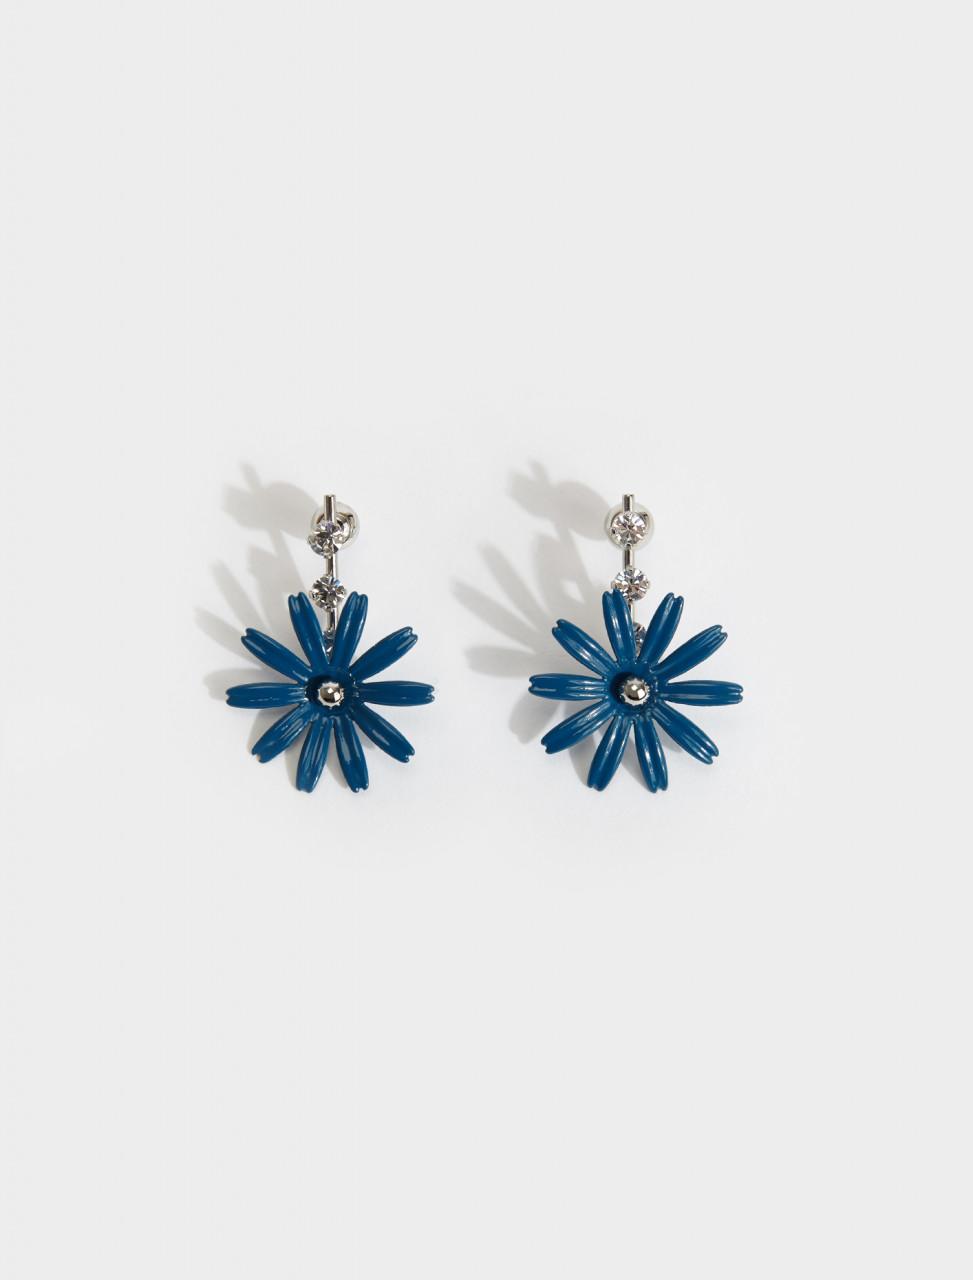 ORMV0261A0-00B64 MARNI EARRINGS BLUE